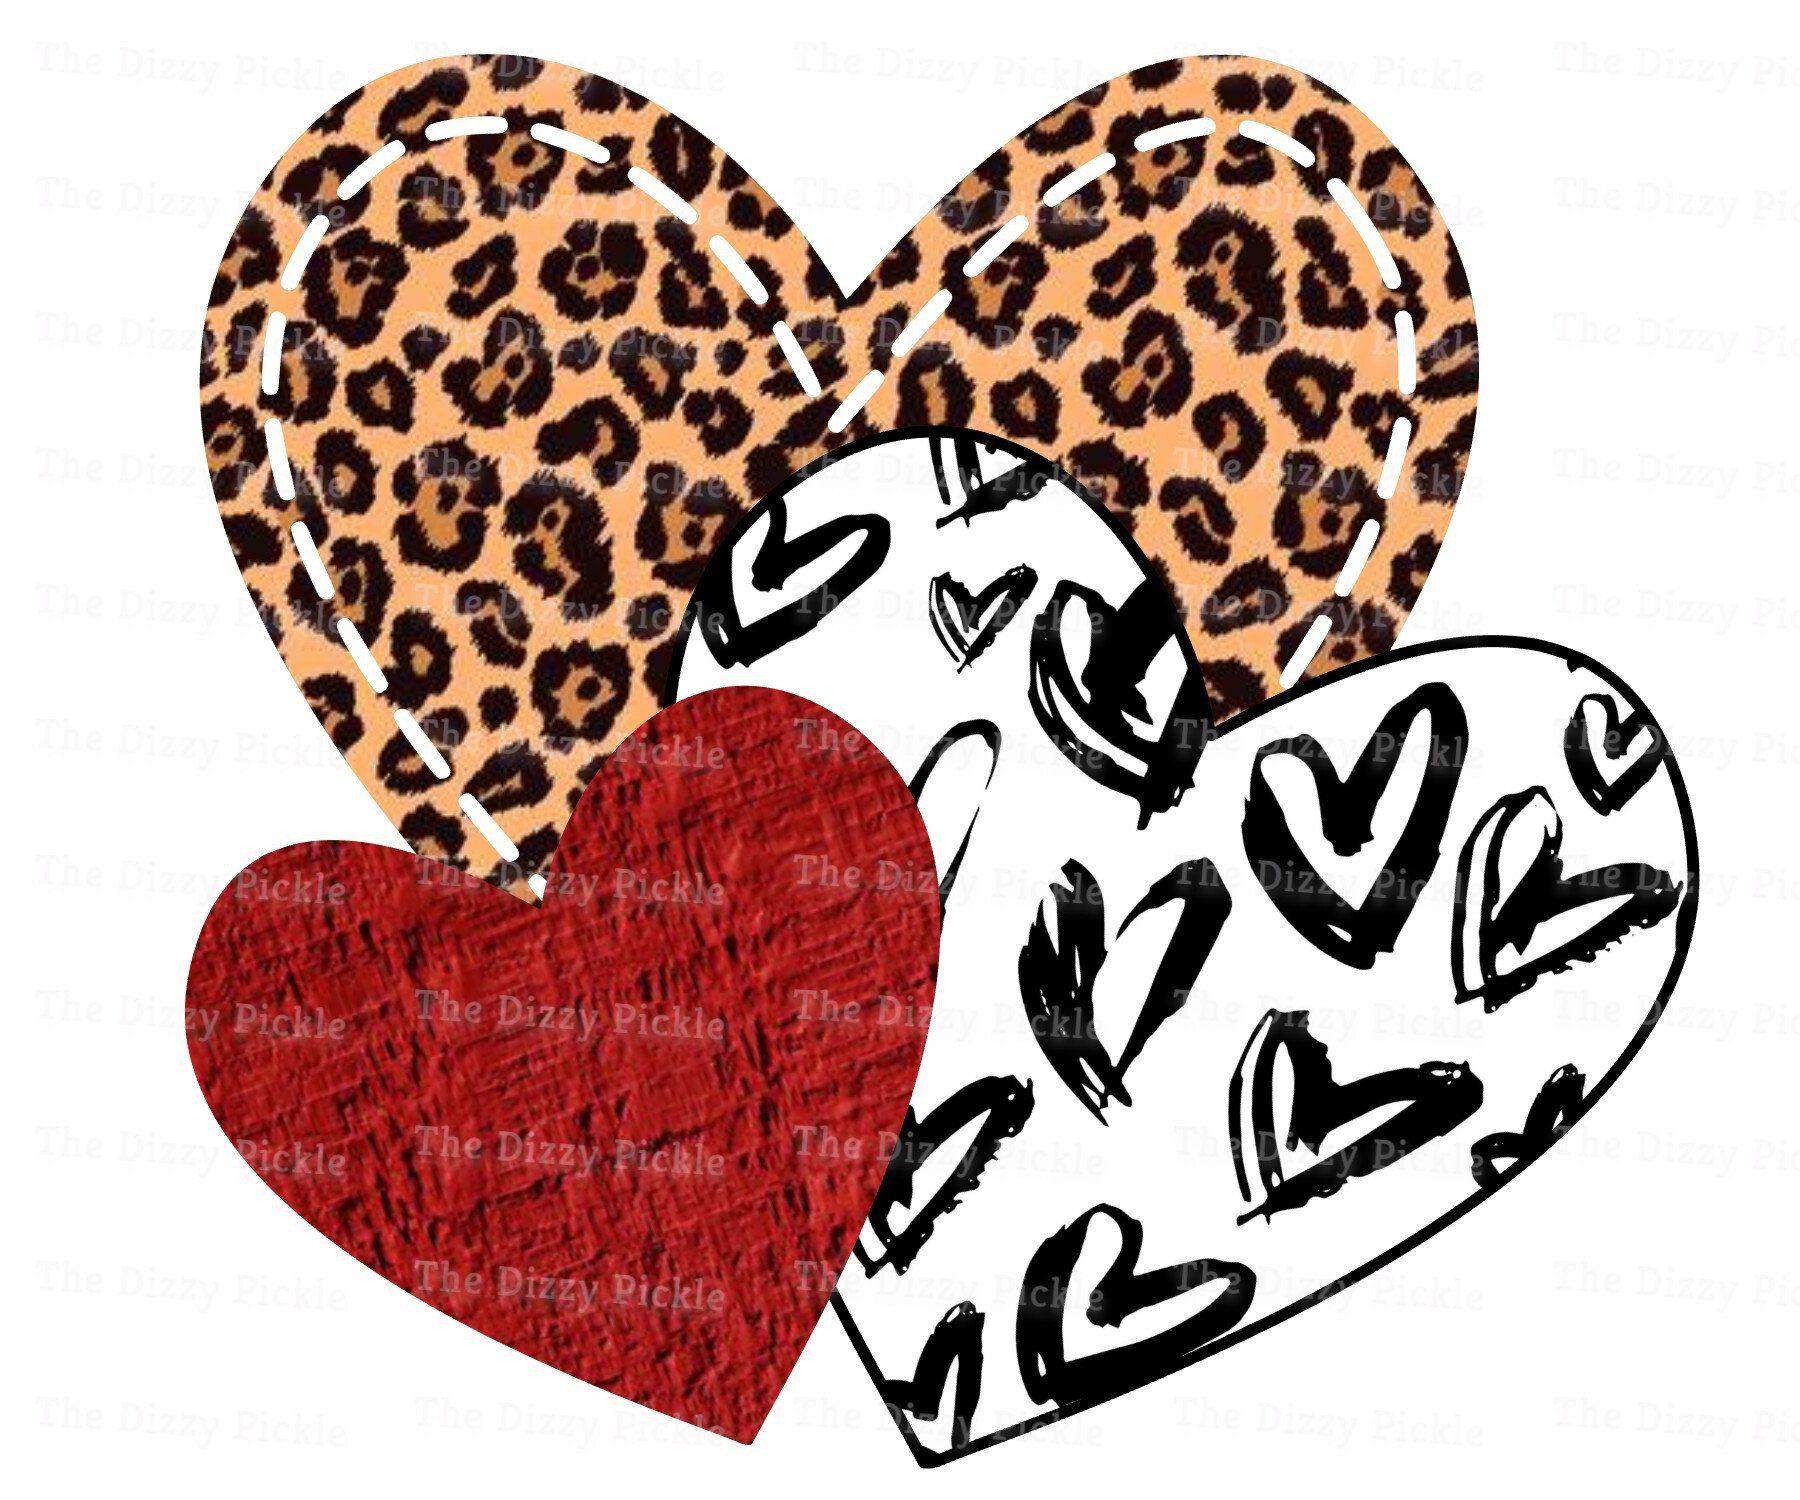 Heart Sublimation Design Hearts Leopard Heart Valentines Etsy In 2021 Shirt Print Design Valentines Design Valentines Shirt